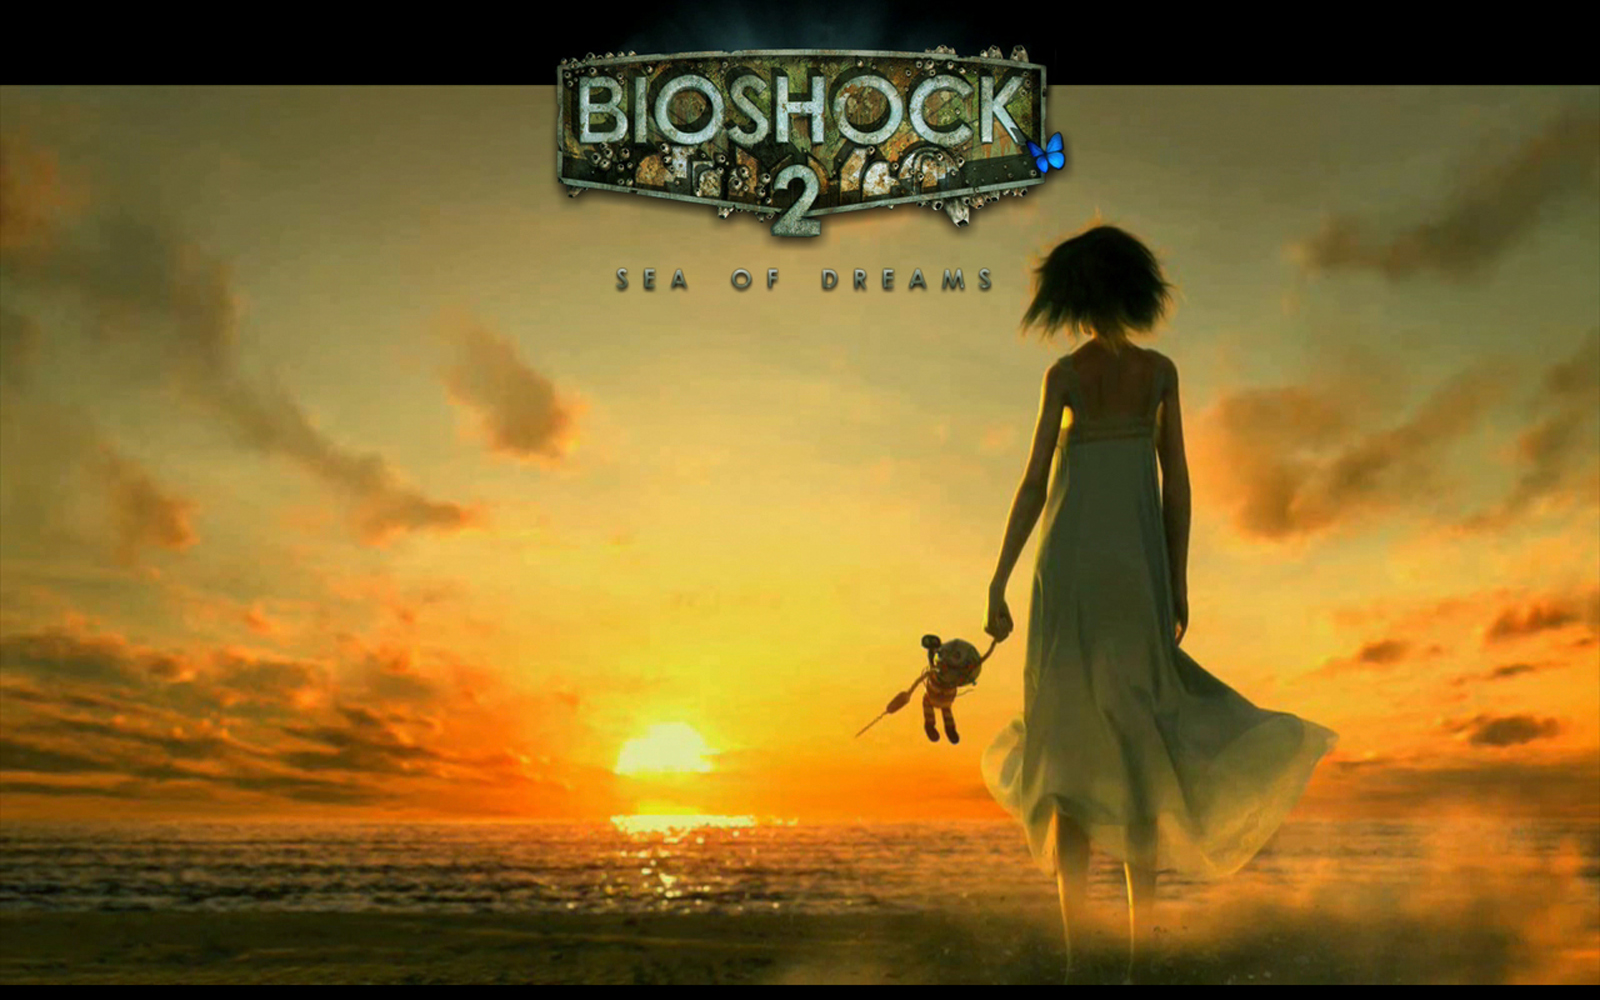 http://3.bp.blogspot.com/-kQztUCtj2_E/TnZO3dNGBDI/AAAAAAAABIg/L5E5eqKGJL4/s1600/BioShock_2_desktop_backgrounds_hd_wallpapers_GameWallBase.com.jpg